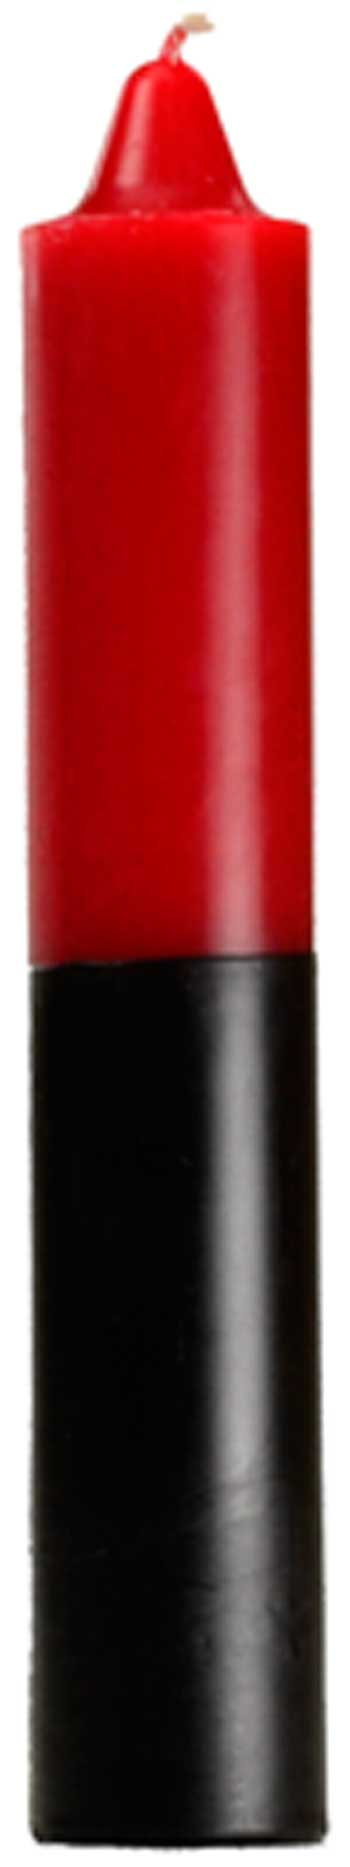 "9"" Red- Black Jumbo Candle"